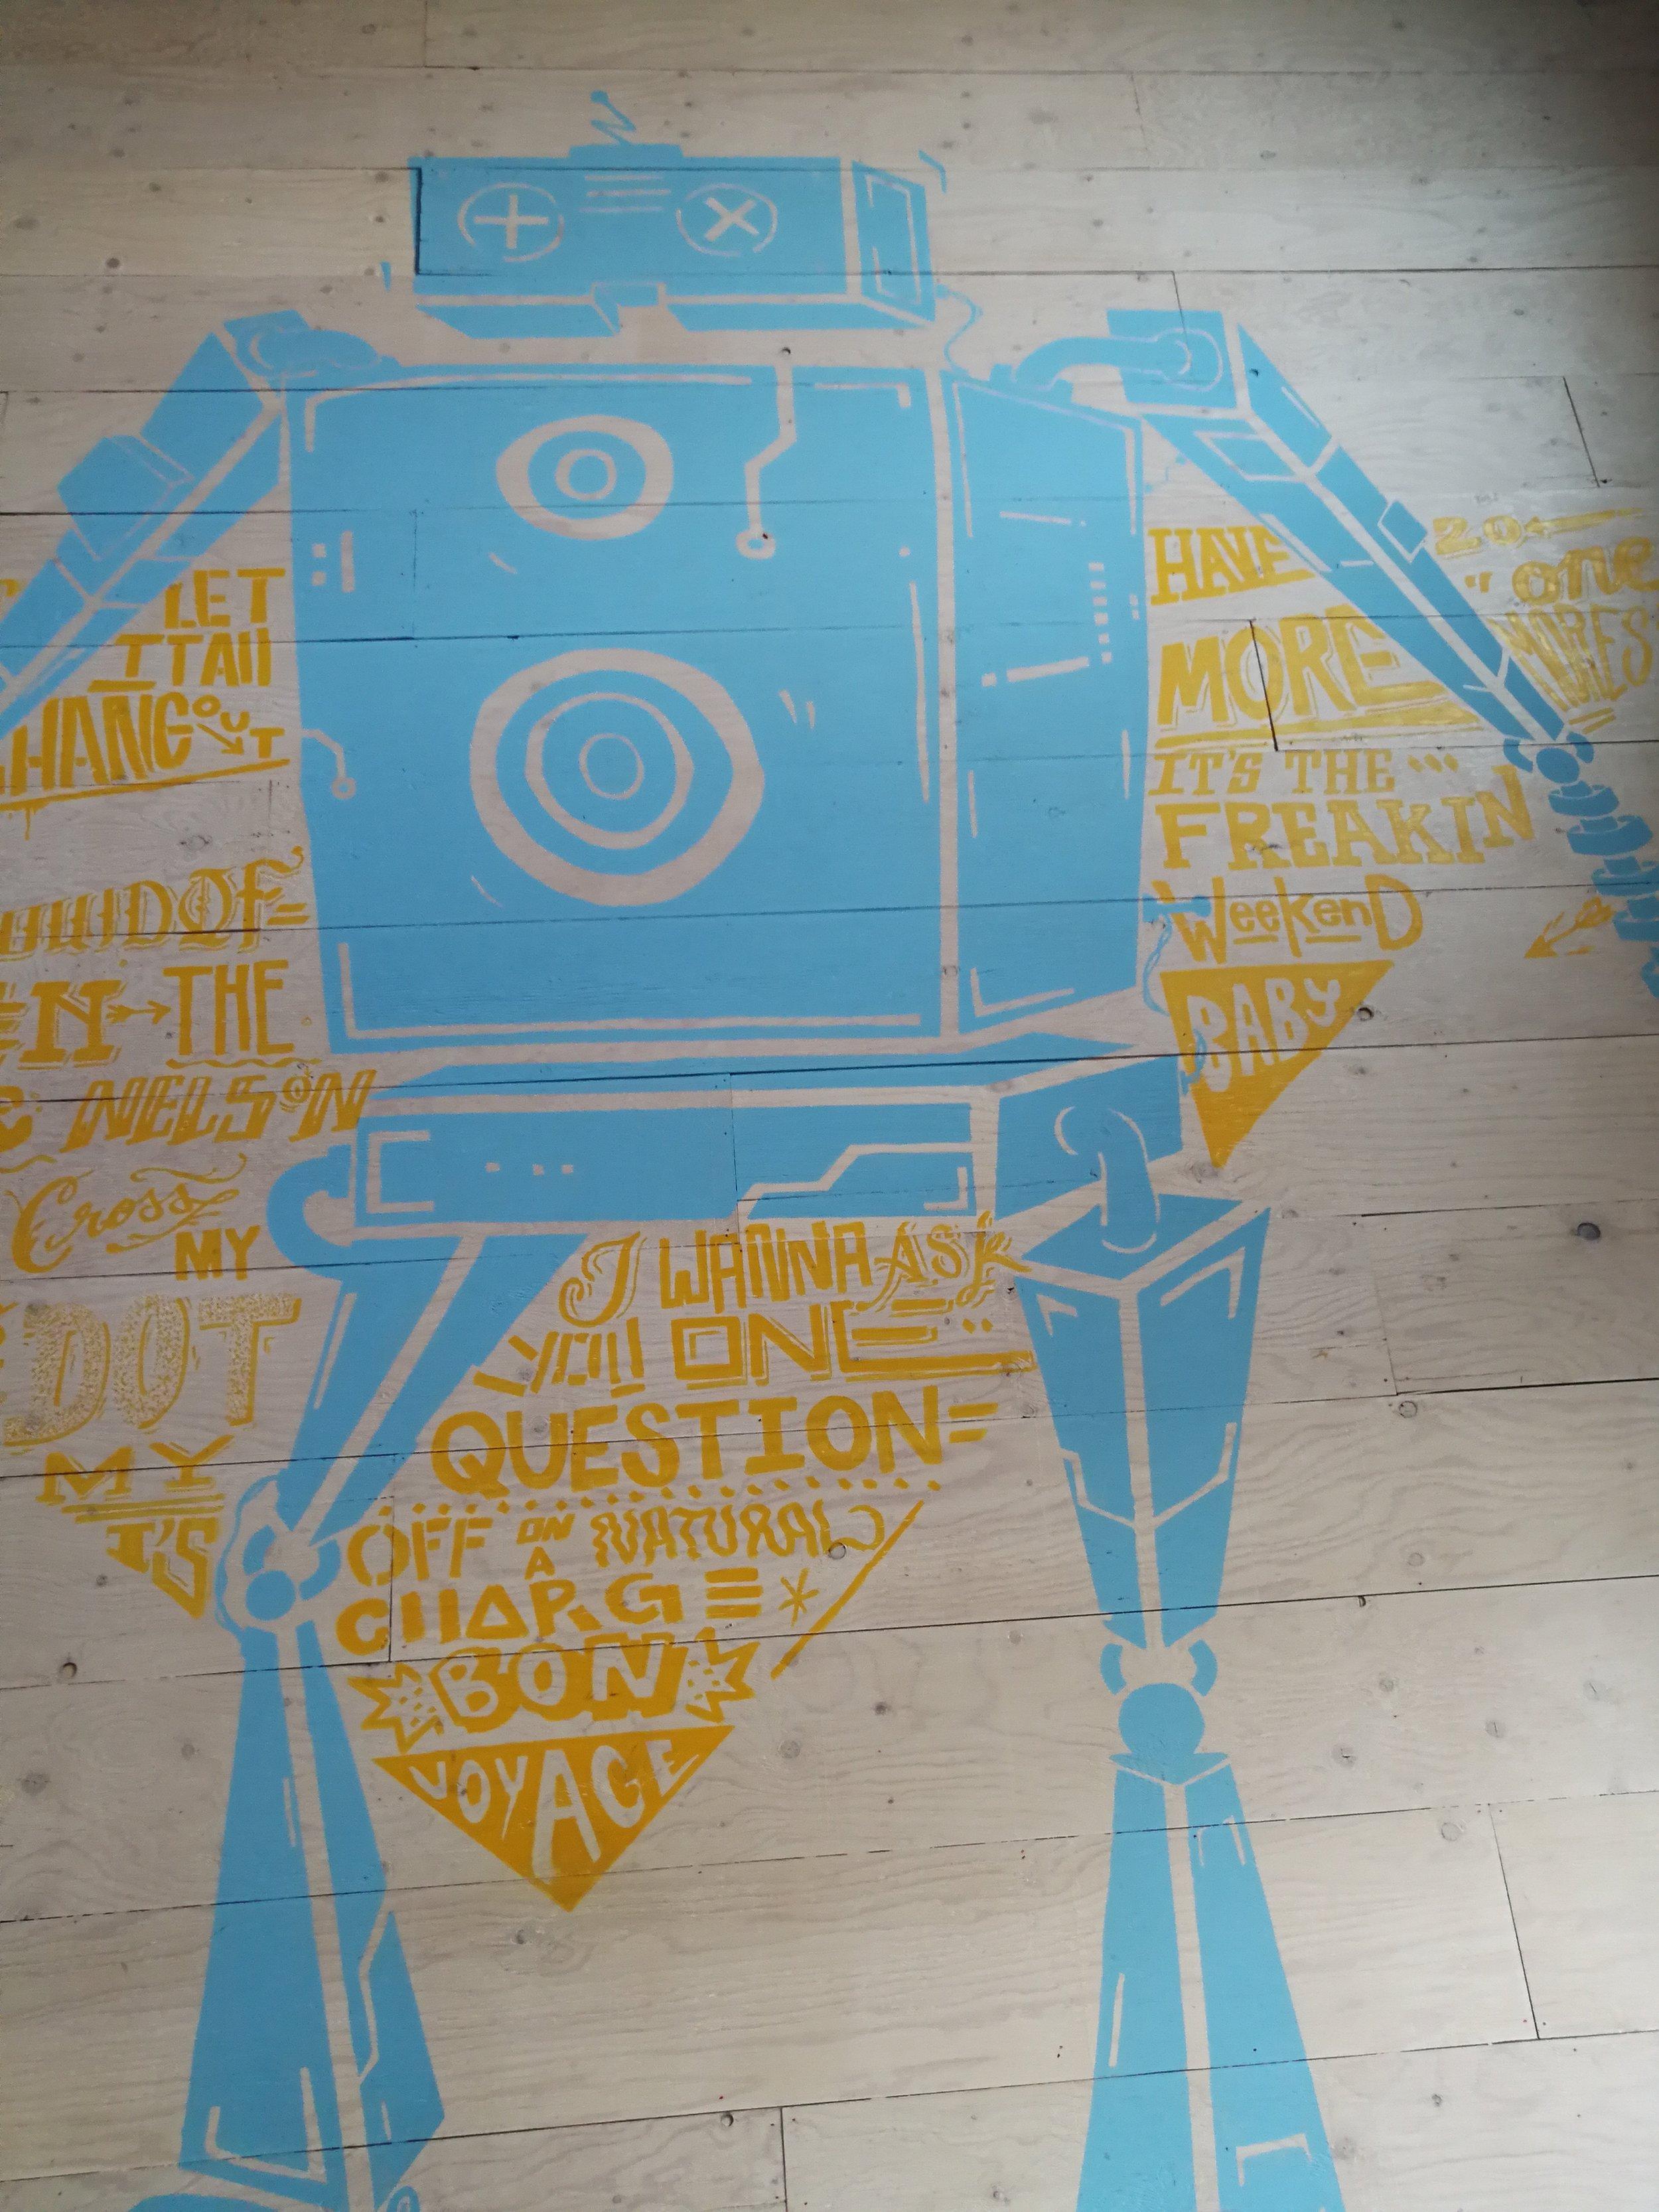 2. Good Robot - Brewing Company